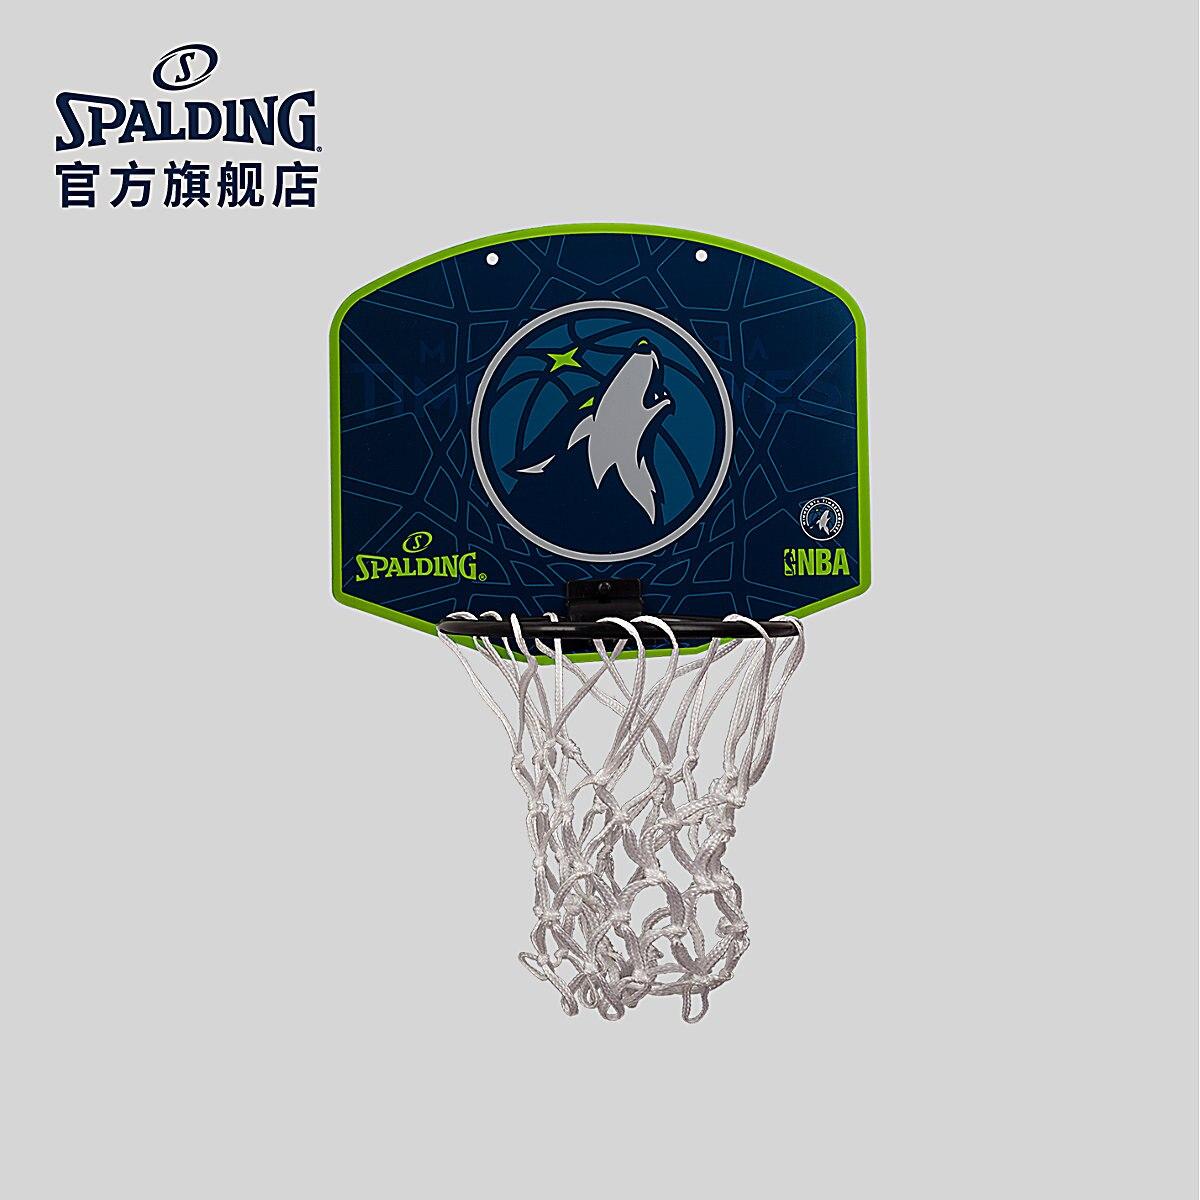 SPALDING Boys Sports Hanging Basketball Board (Entertainment) Emblem Mini Backboard